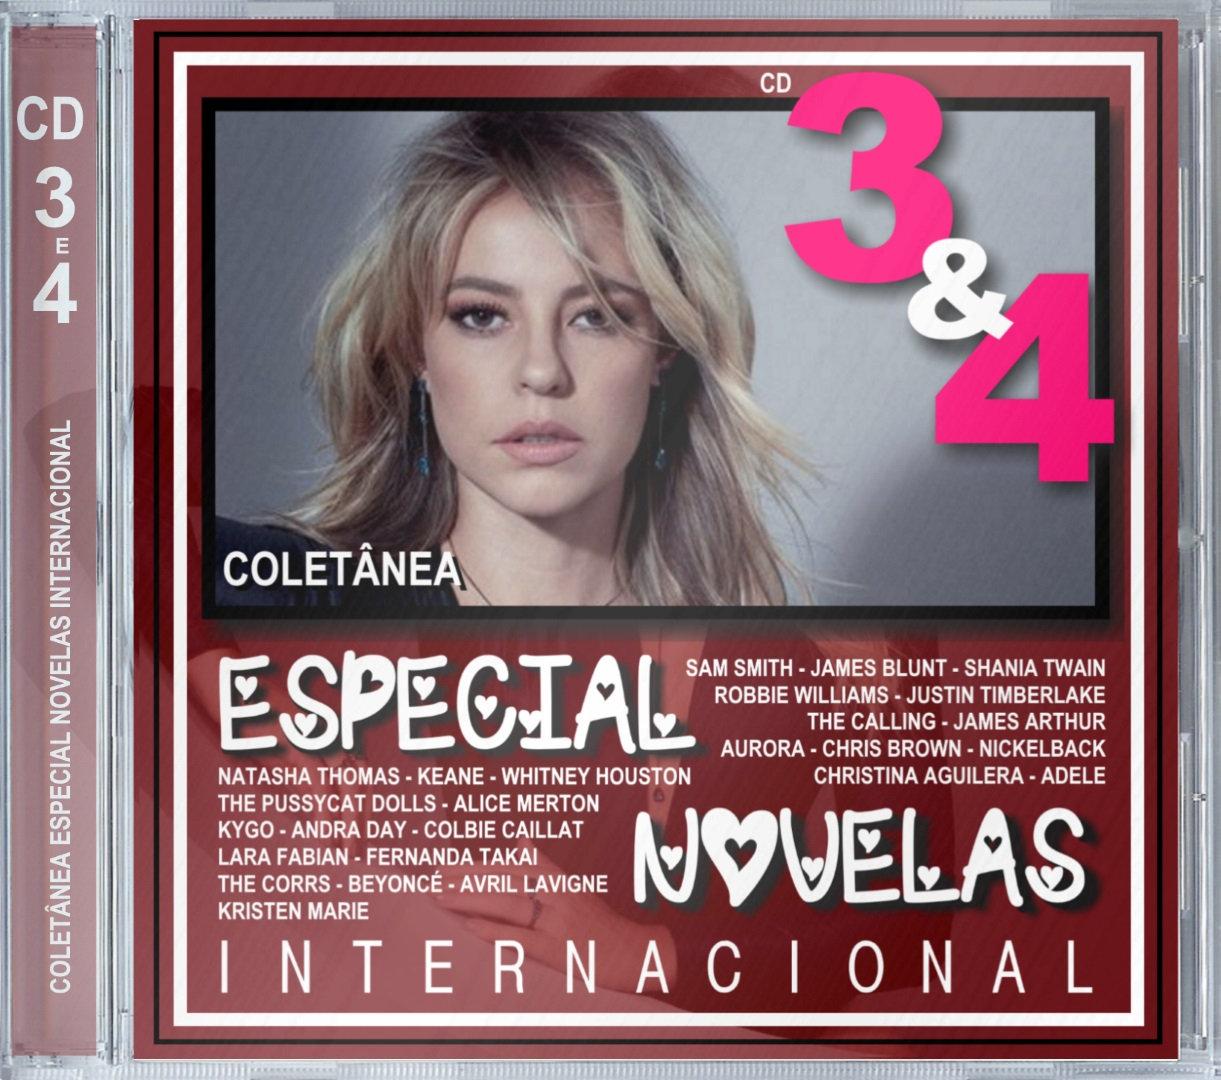 MUSICAS FINA CD ESTAMPA INTERNACIONAL BAIXAR DO